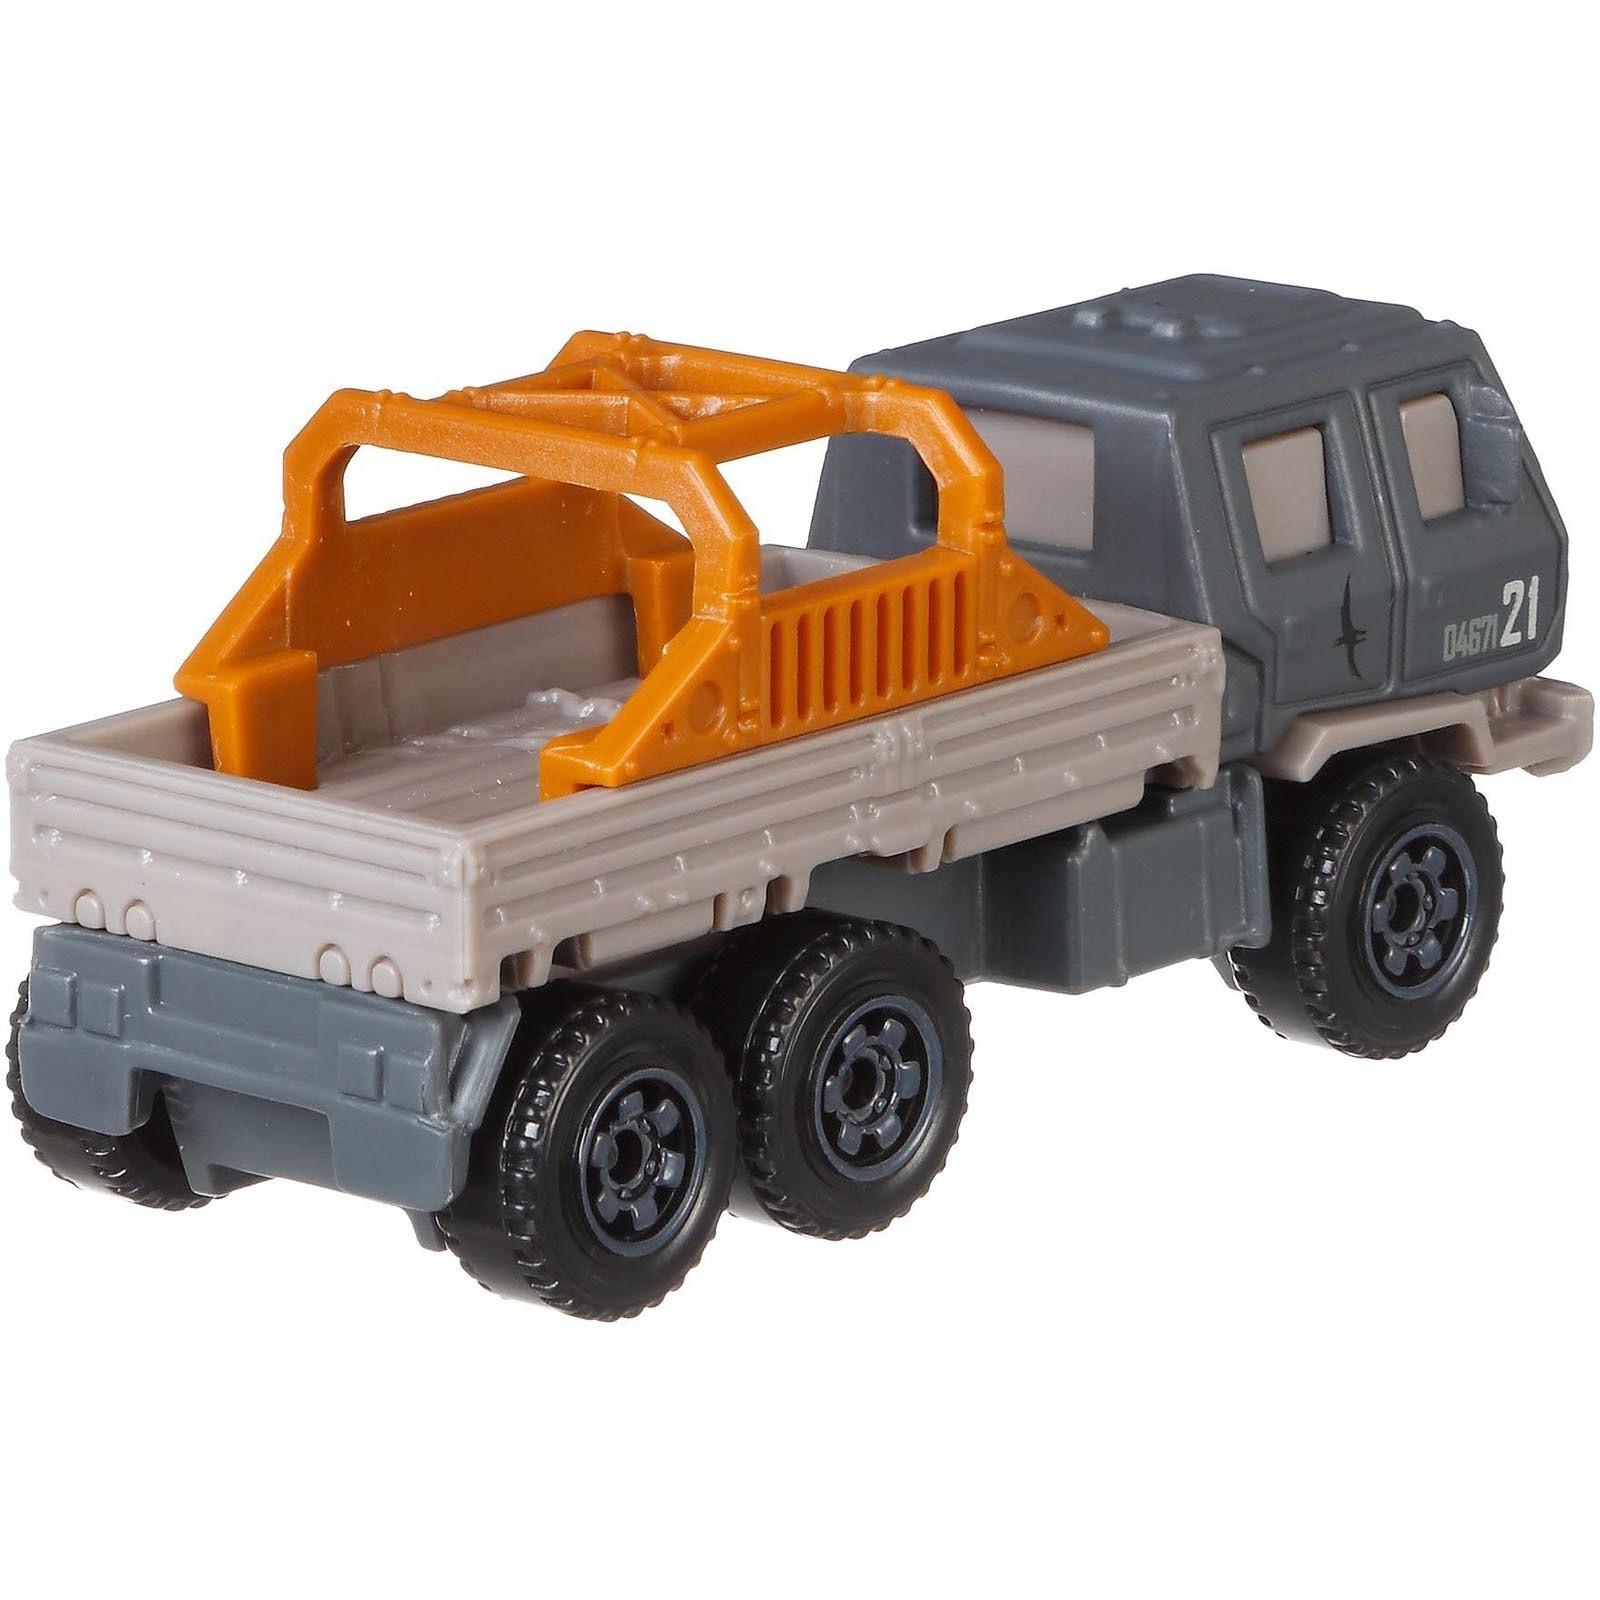 Matchbox - Off - Road Rescue Rig - Jurassic World - FMX05